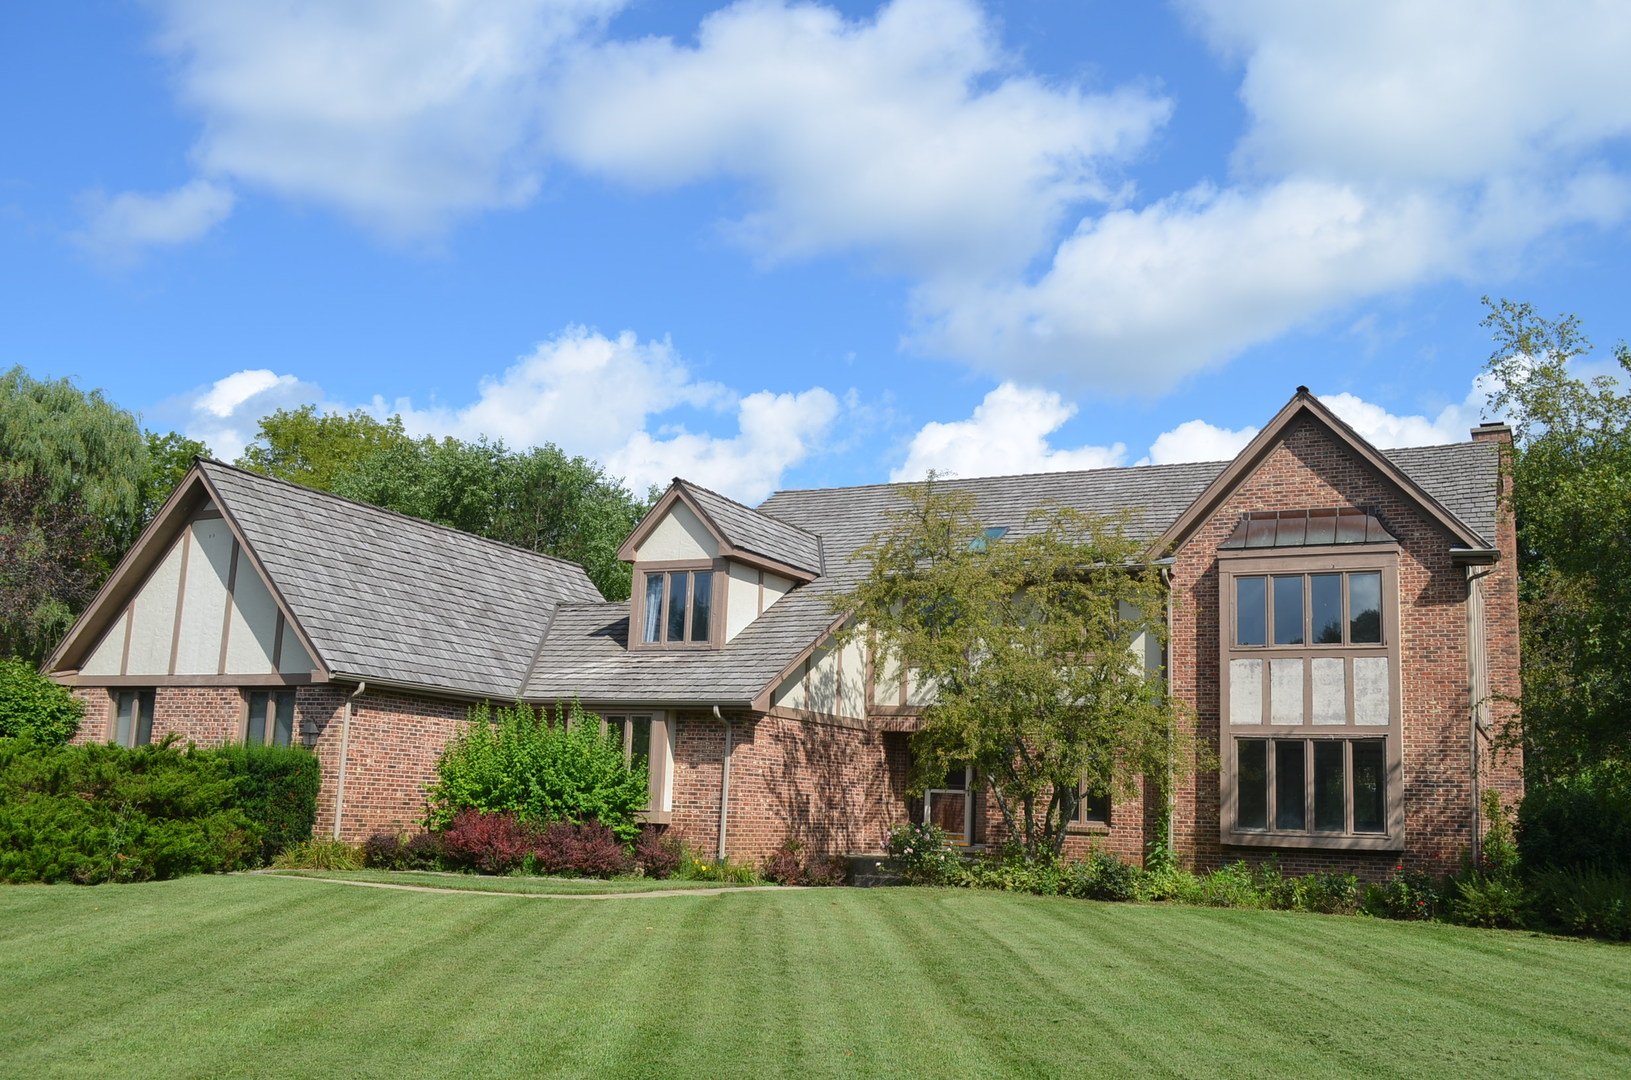 21620 North Stoneybrook Court, Kildeer, Illinois 60047